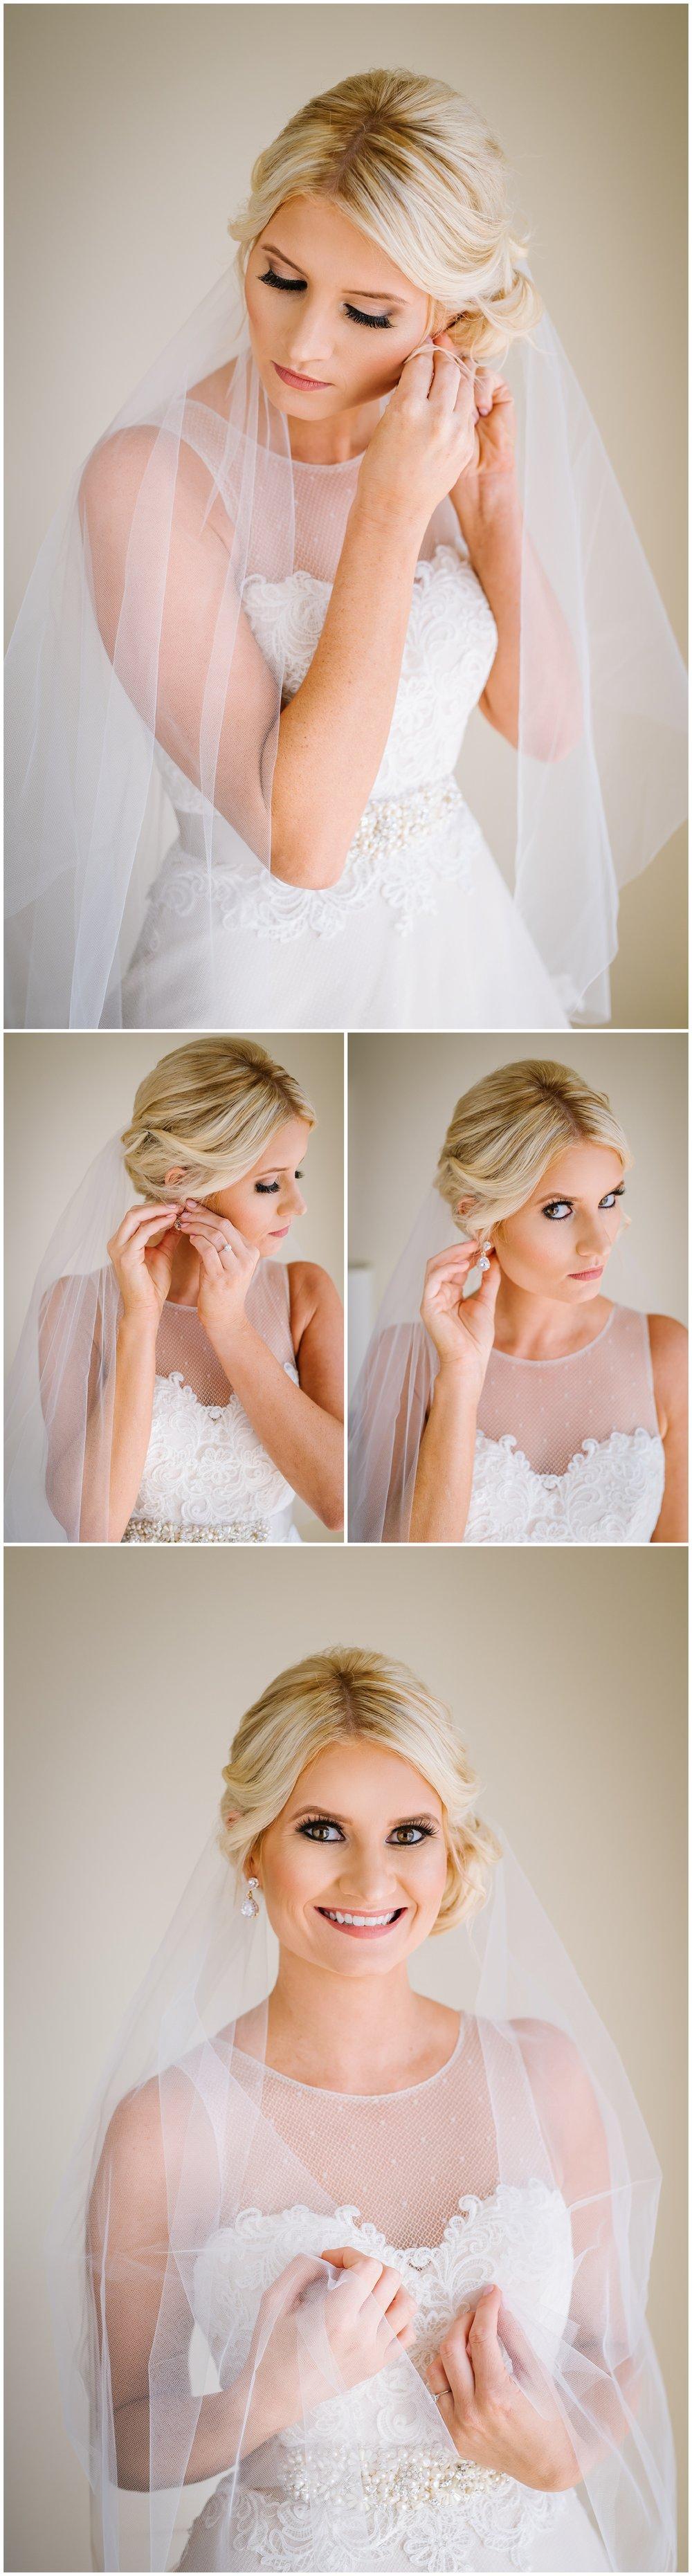 Sarasota-wedding-photographer-hyatt-regency-blush_0021.jpg